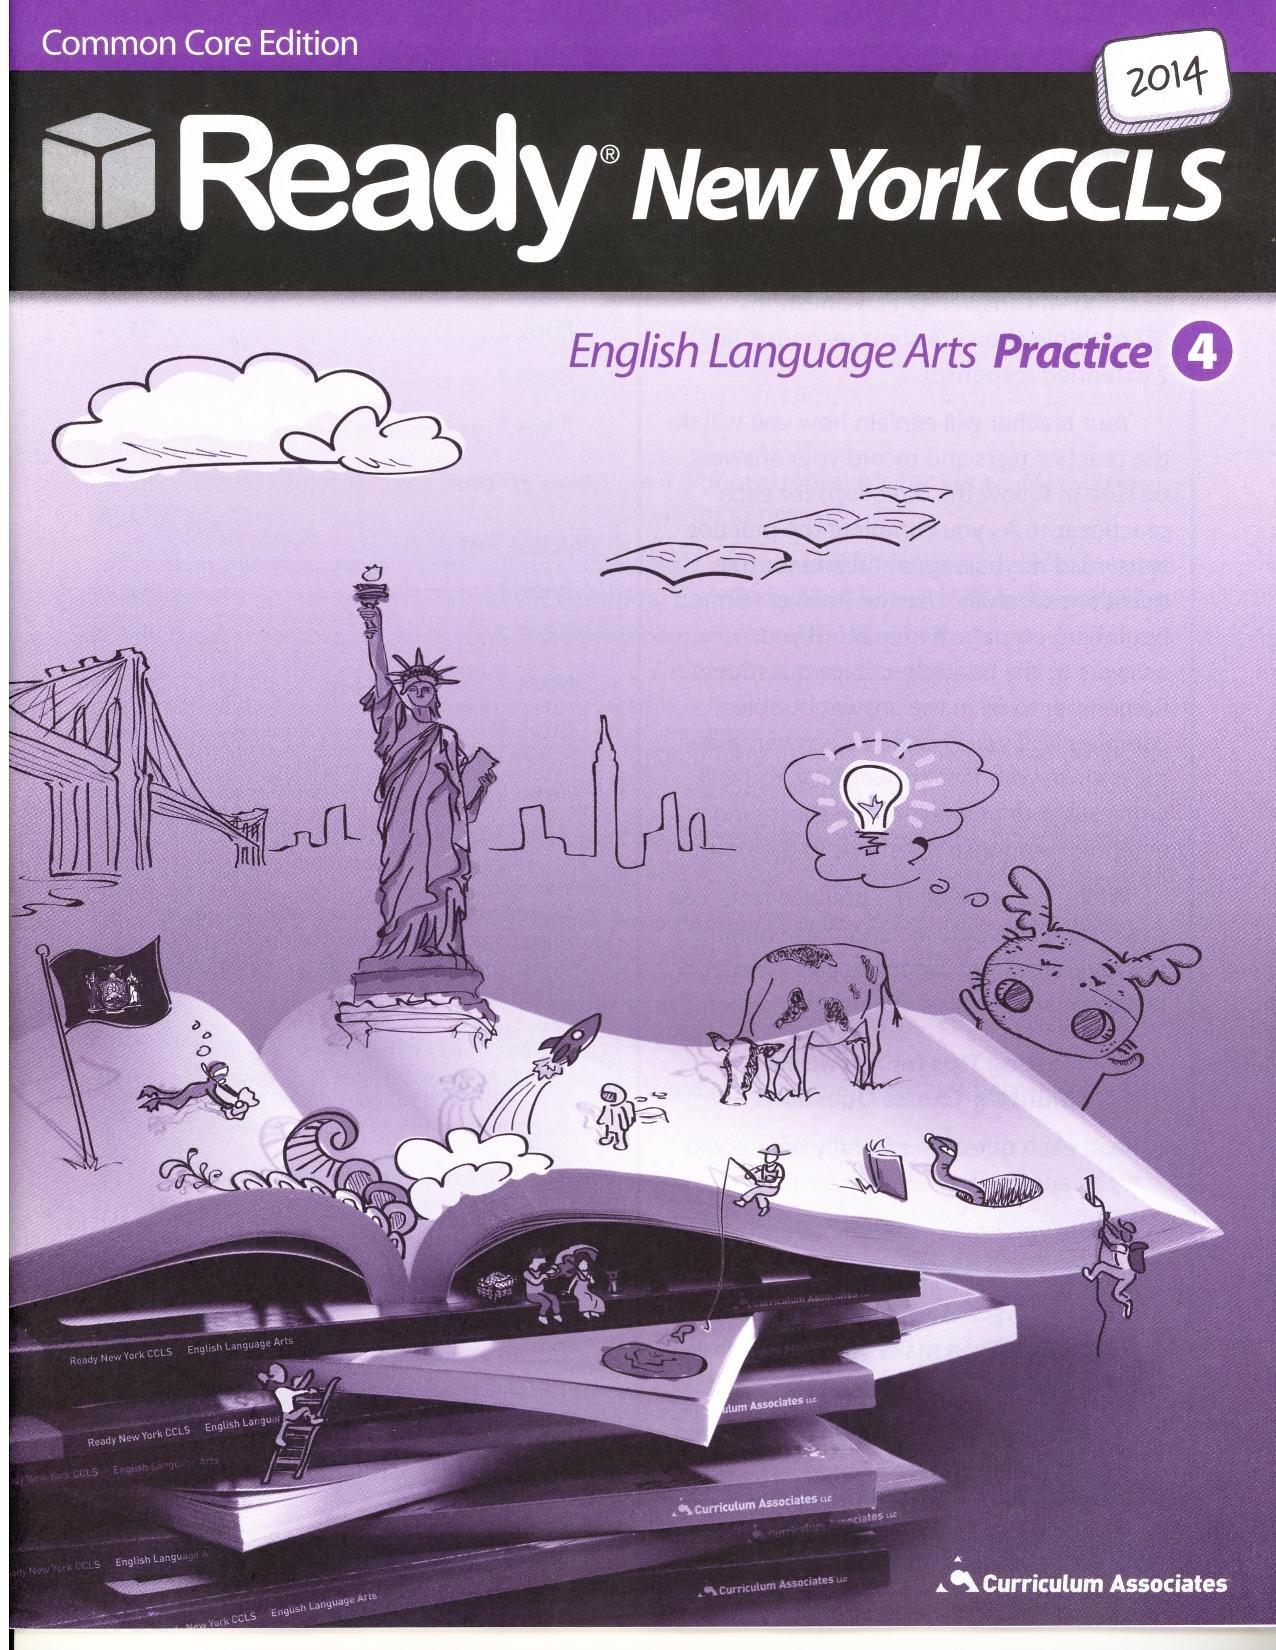 Amazon.com: Ready New York CCLS: English Language Arts Practice 2014, Grade  4 (9780760983652): Curriculum Associates: Books